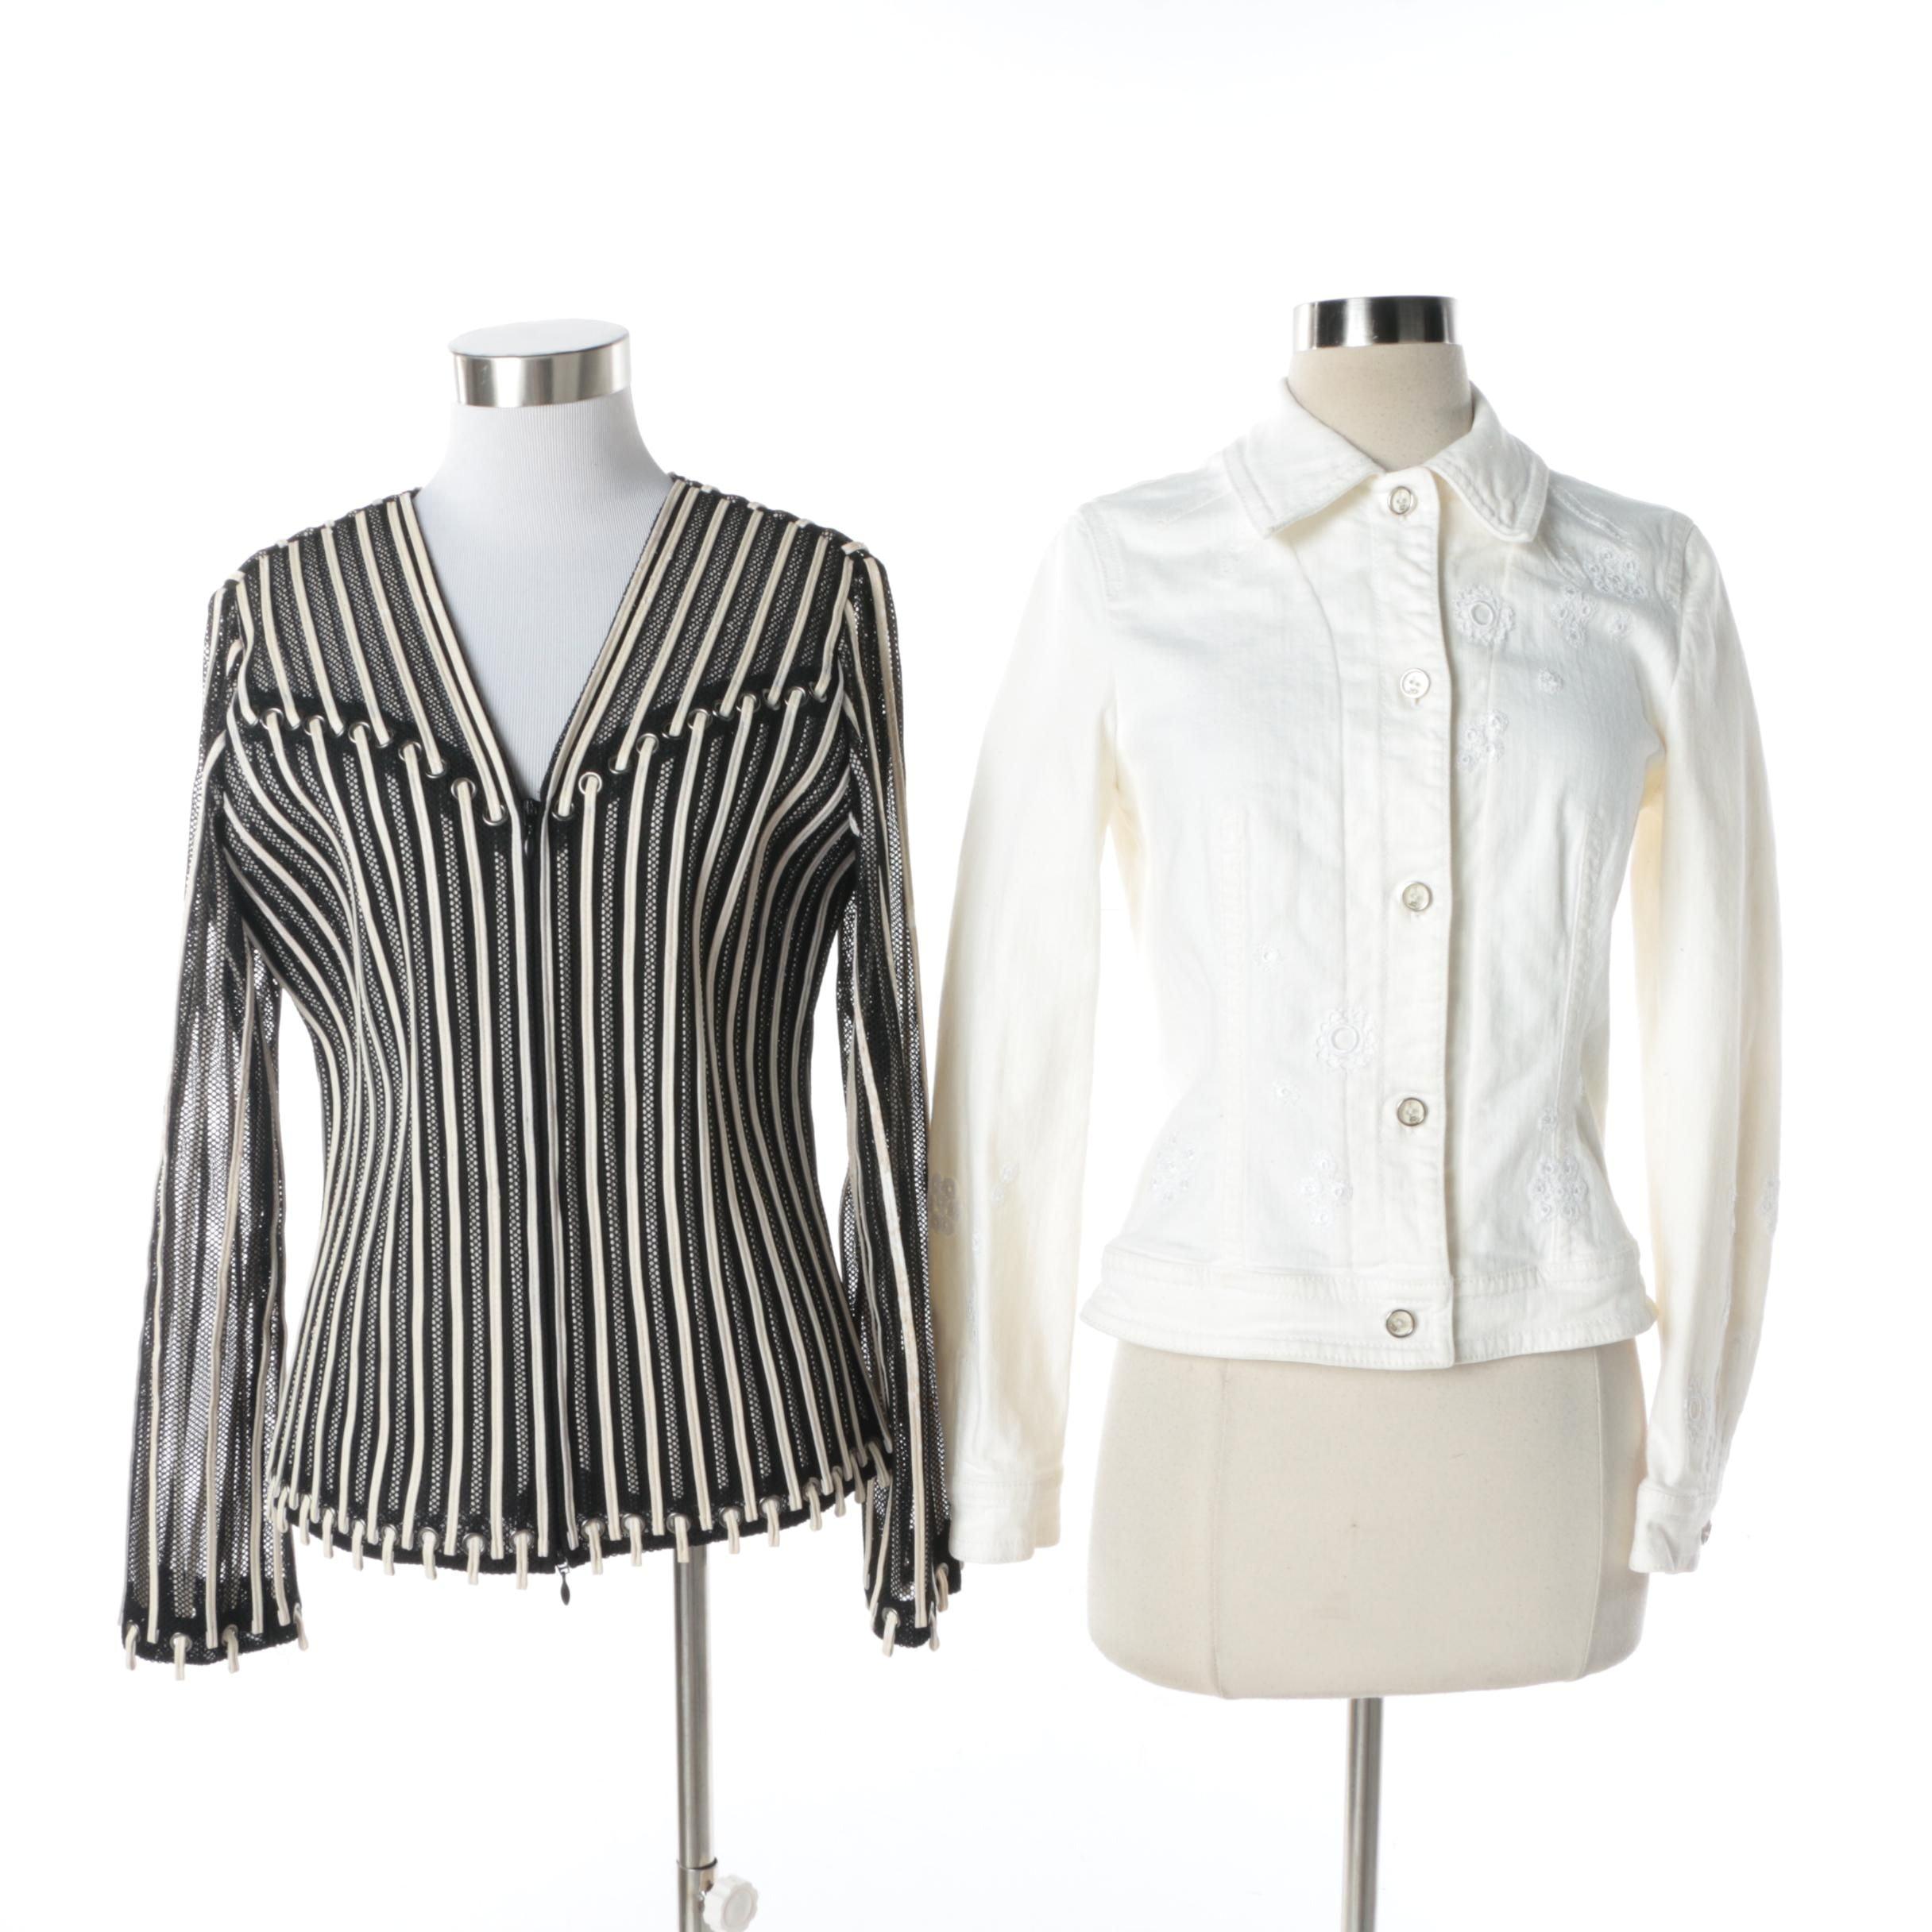 Women's Escada Denim Jacket and Obstinee by Ika Bias Tape Top